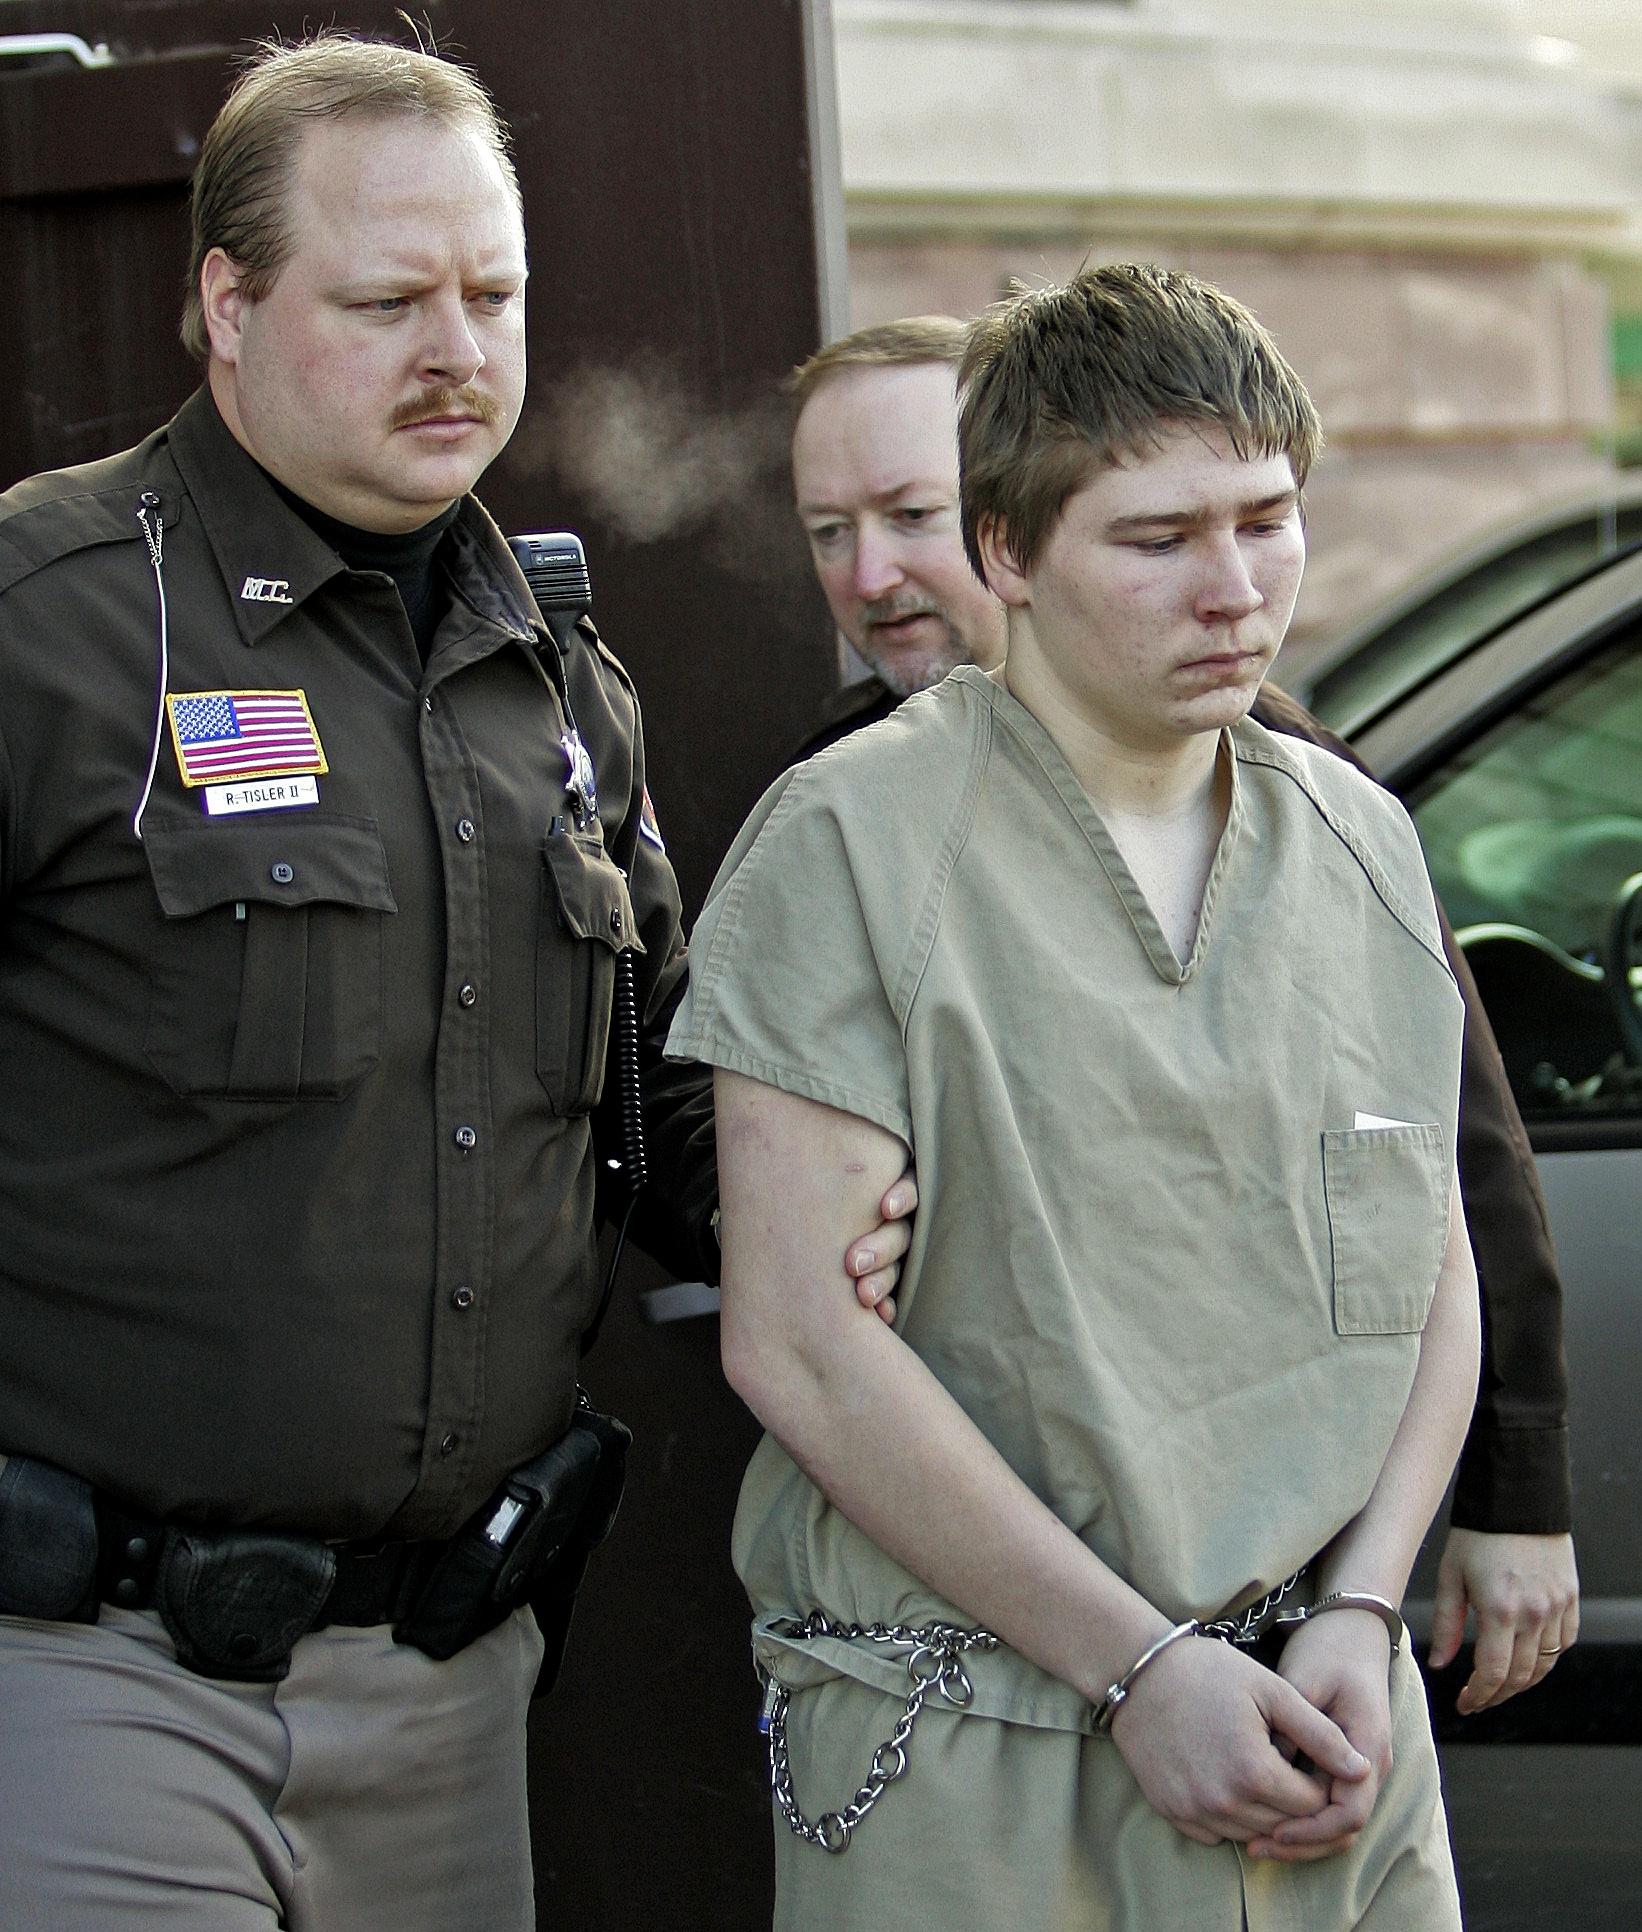 'Making a Murderer's' Brendan Dassey komt vrij